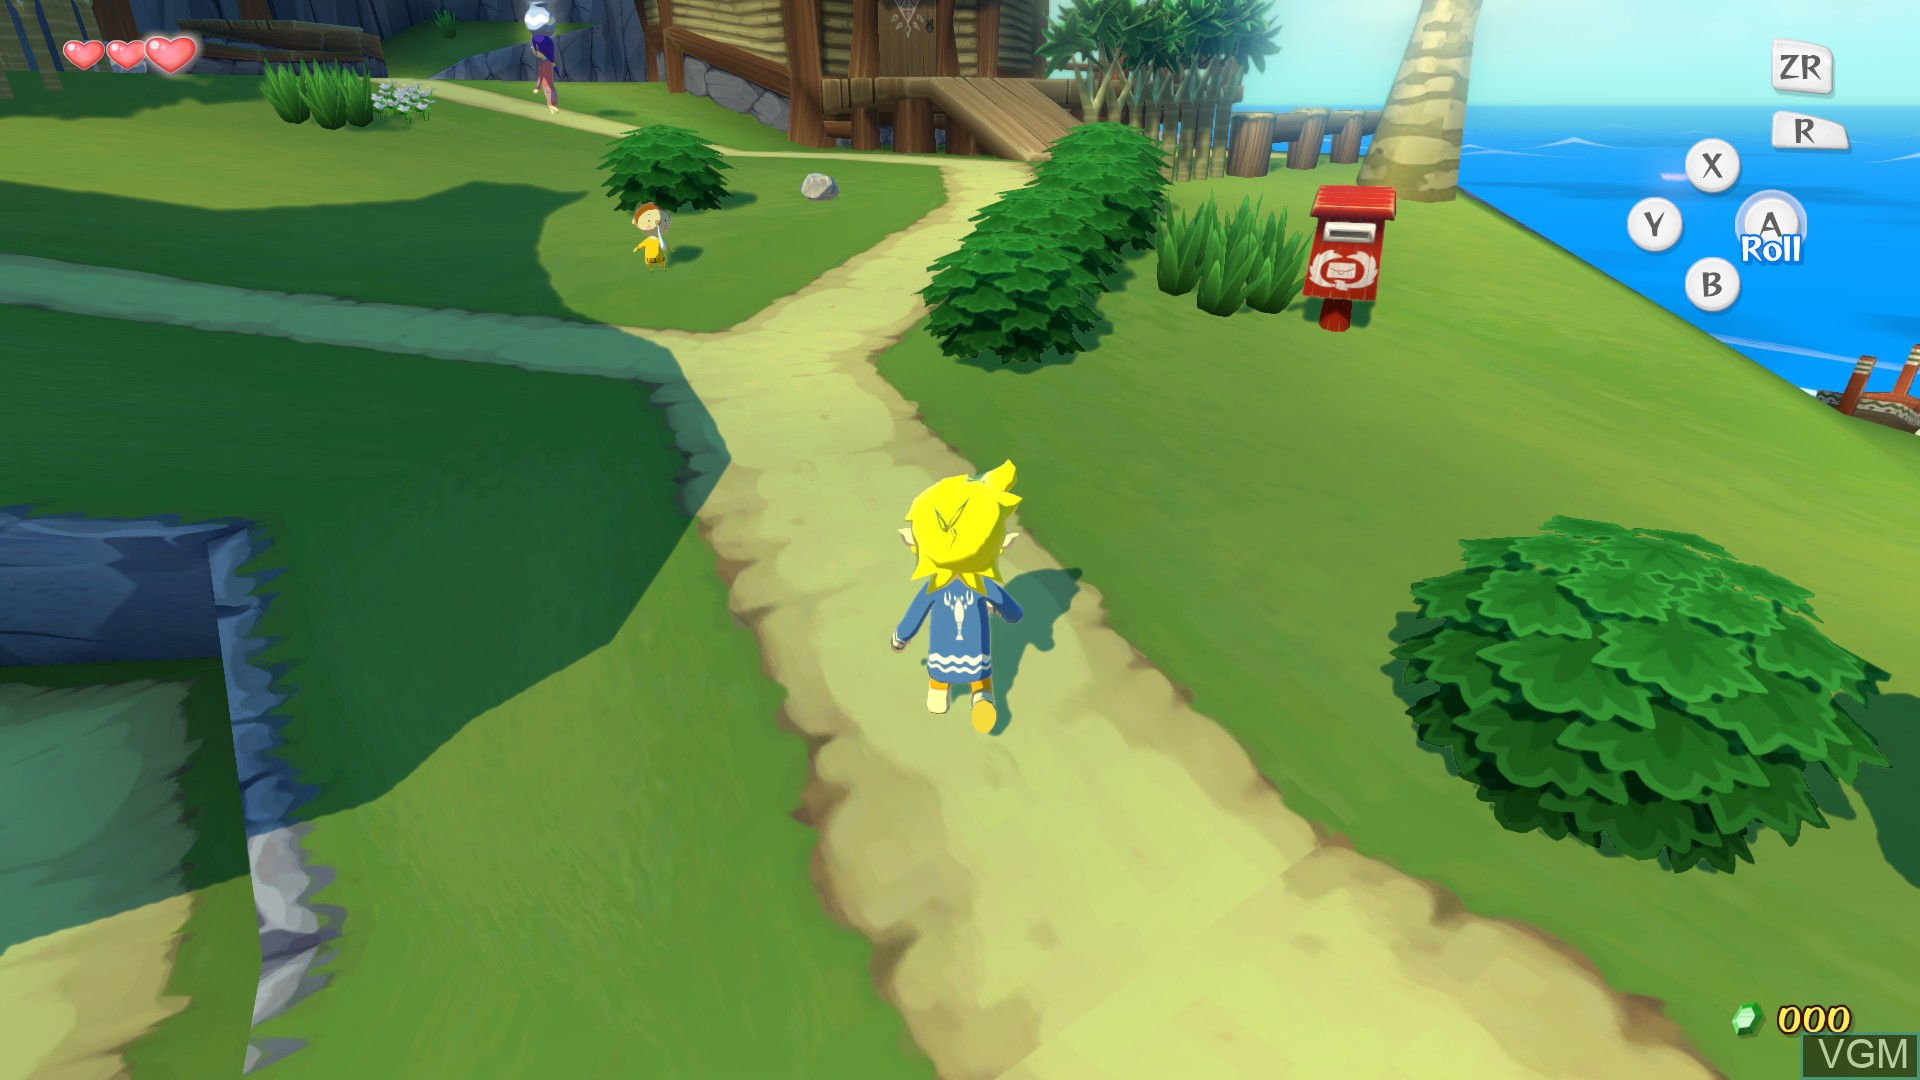 Legend of Zelda, The - The Wind Waker HD